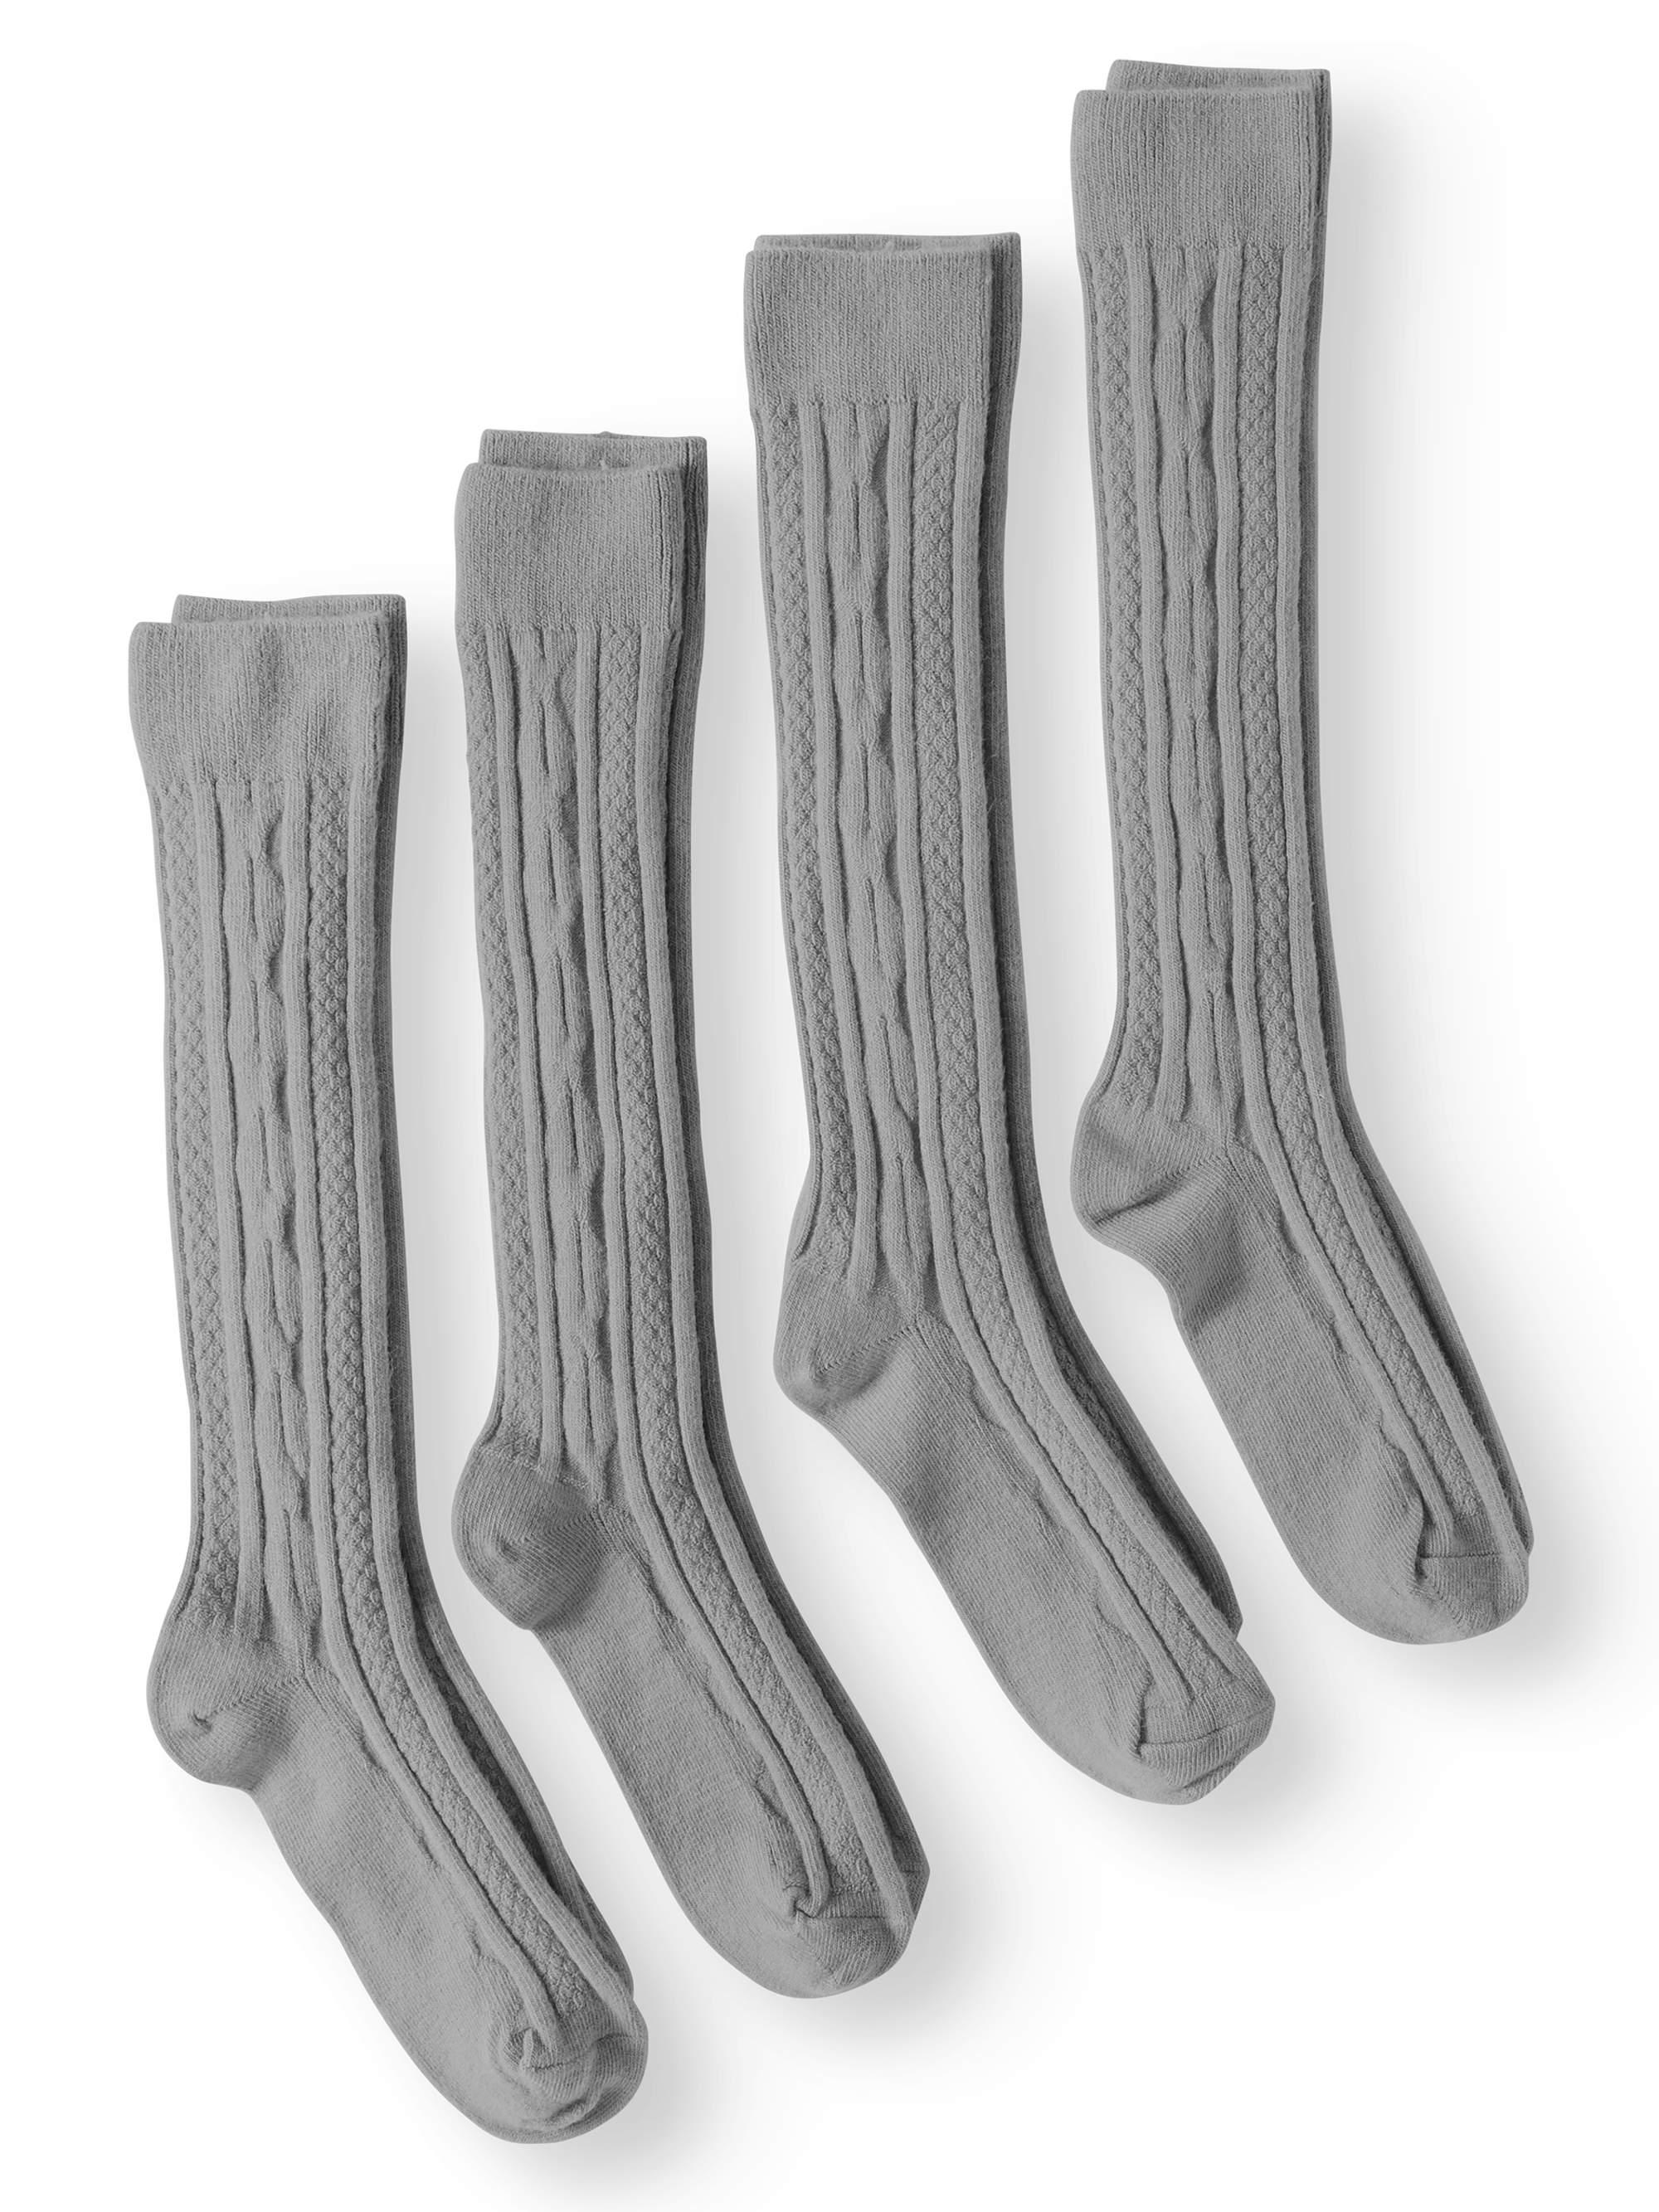 JEFFERIES SOCKS School Uniform Acrylic Cable Knit Knee High Socks, 4 Pairs